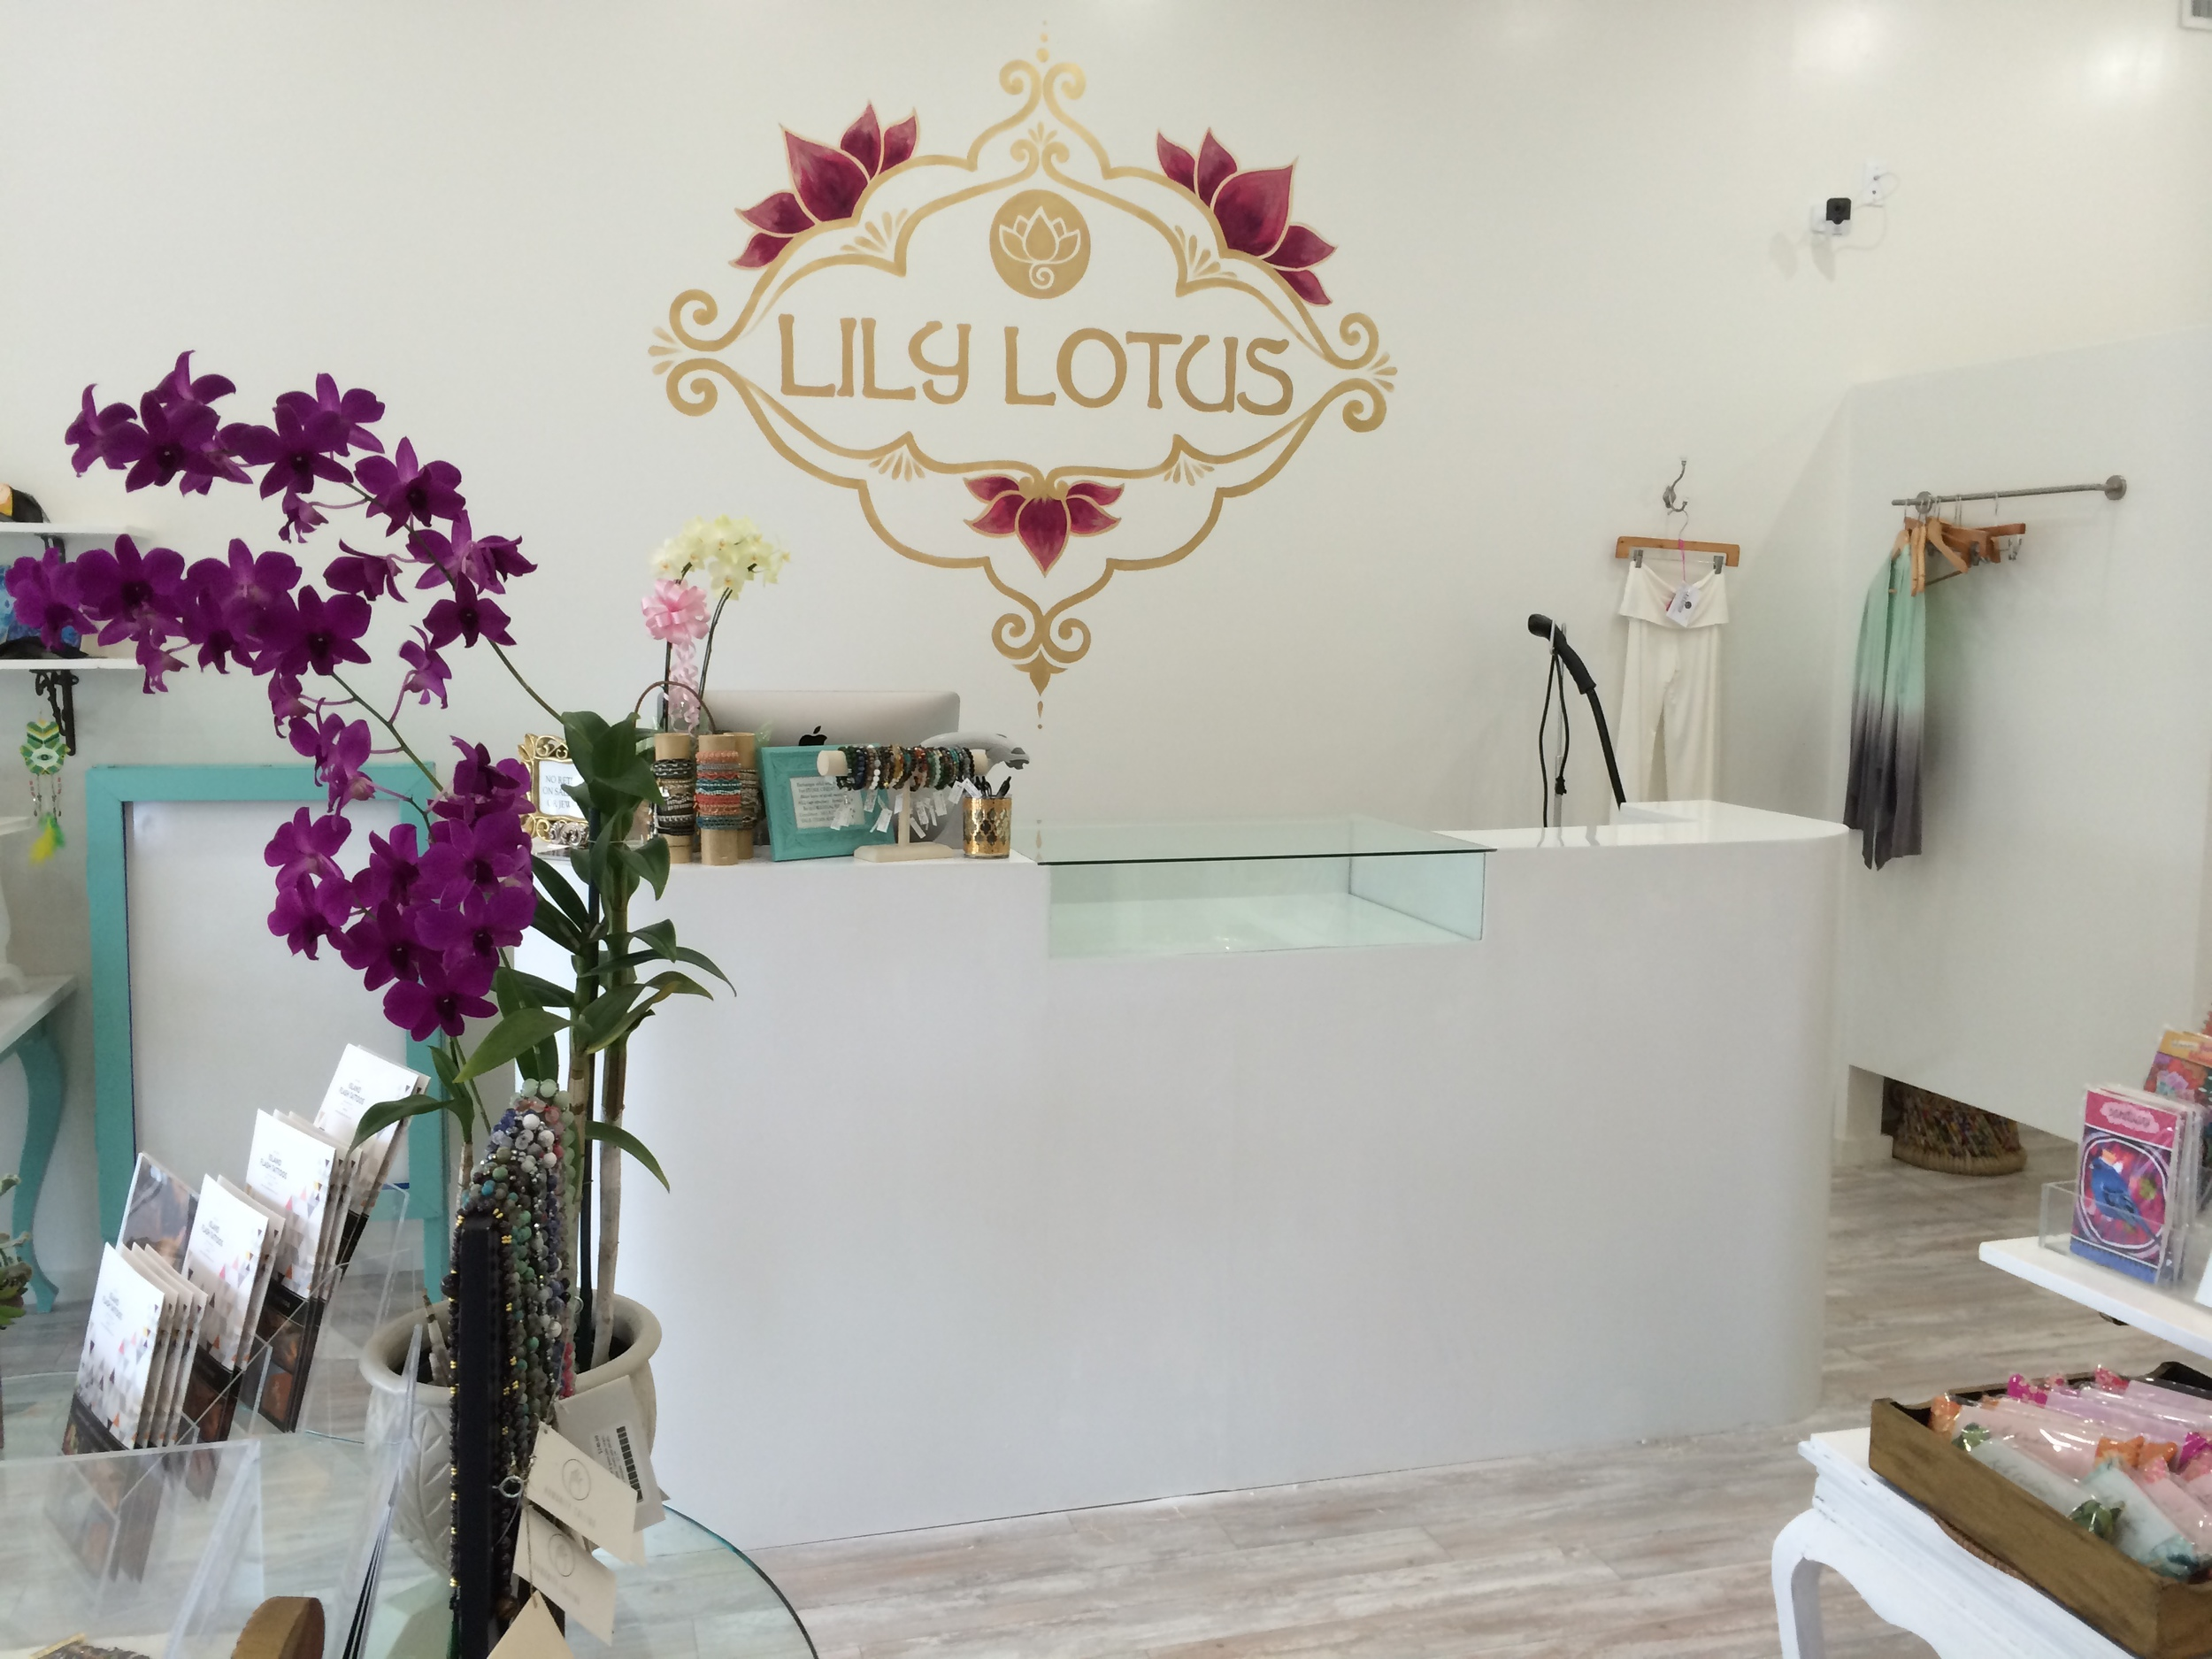 lily lotus.JPG